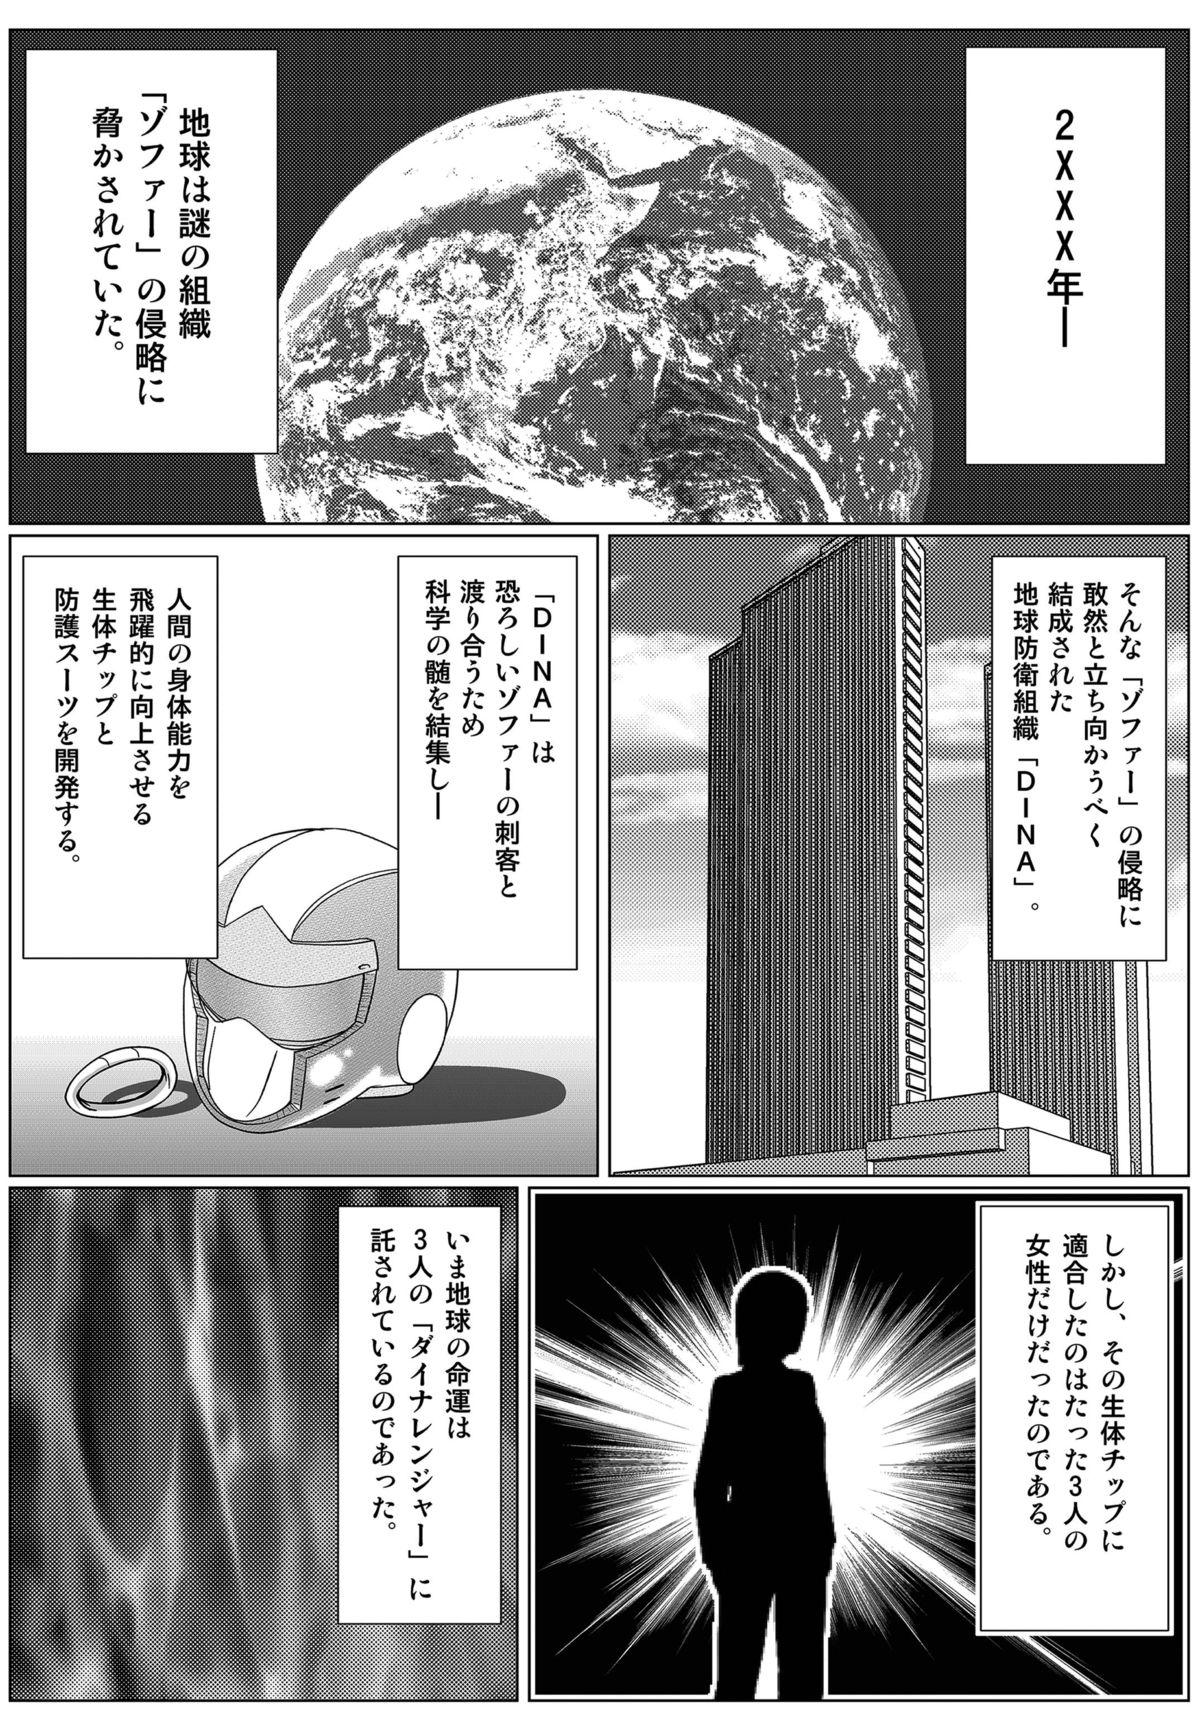 [Macxe's (monmon)] Tokubousentai Dinaranger ~Heroine Kairaku Sennou Keikaku~ Vol.01/02/03 (Renkaban) [Digital] 36